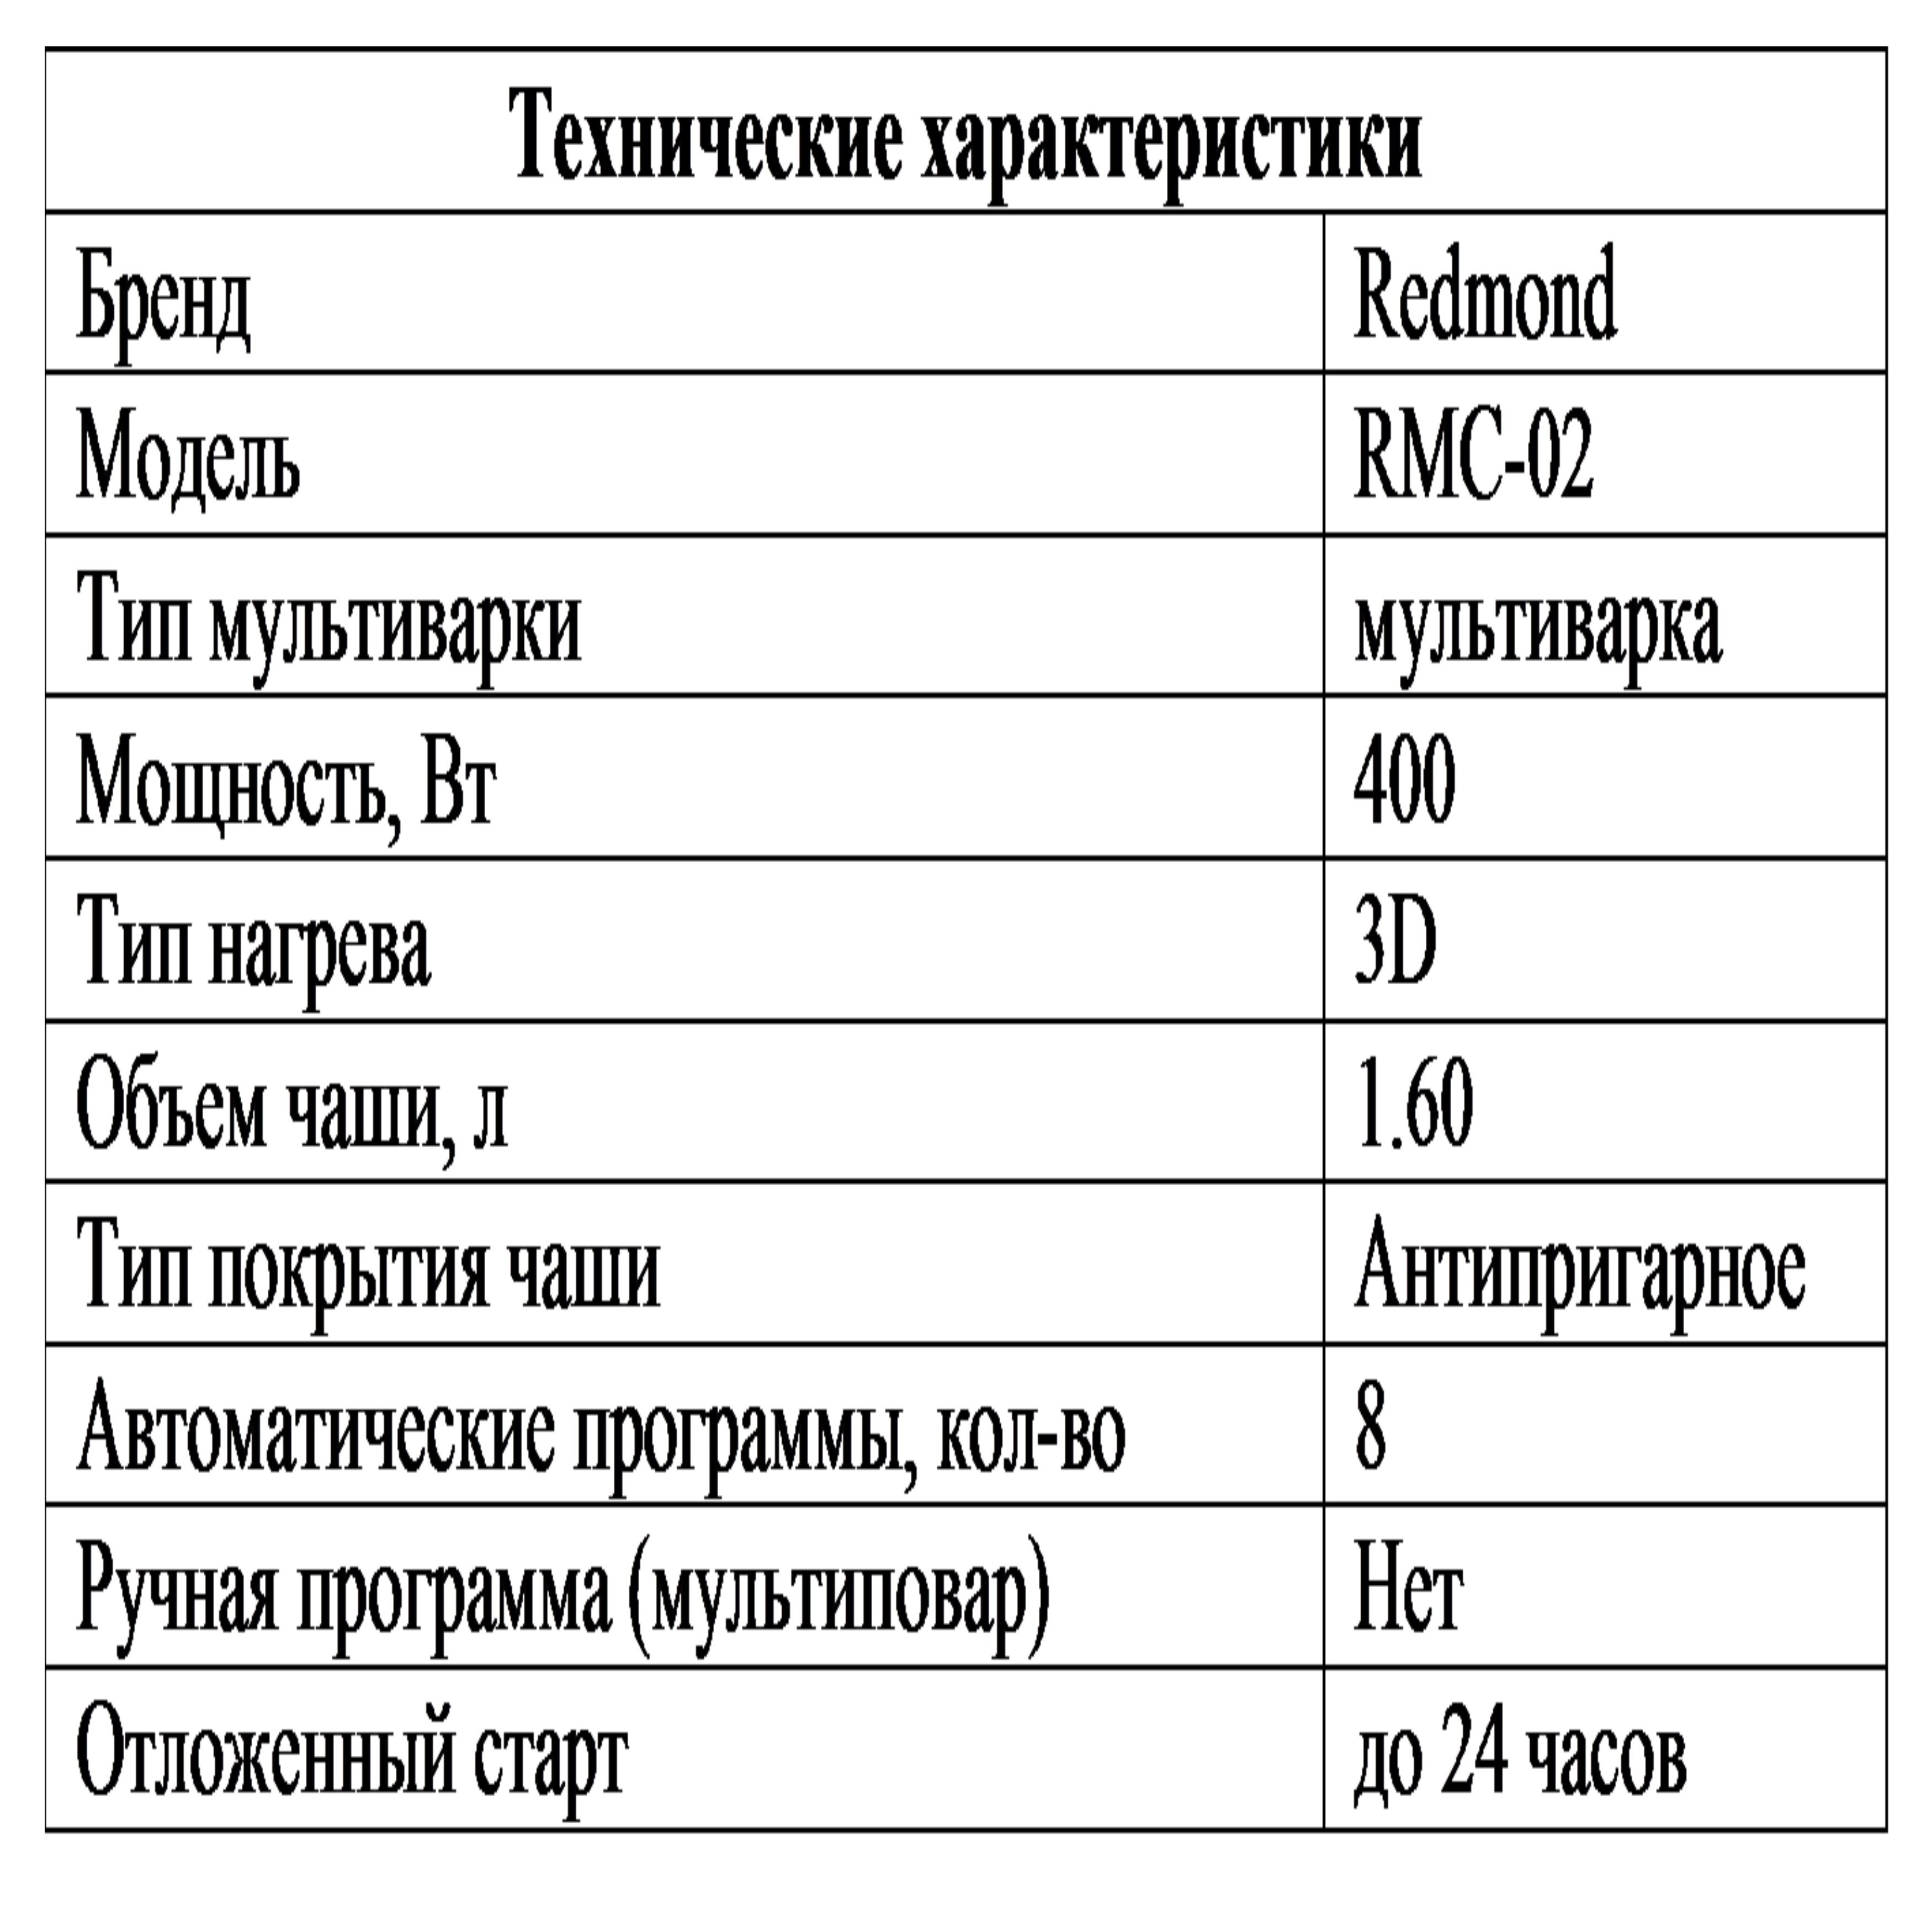 sumeier series multipro инструкция по применению